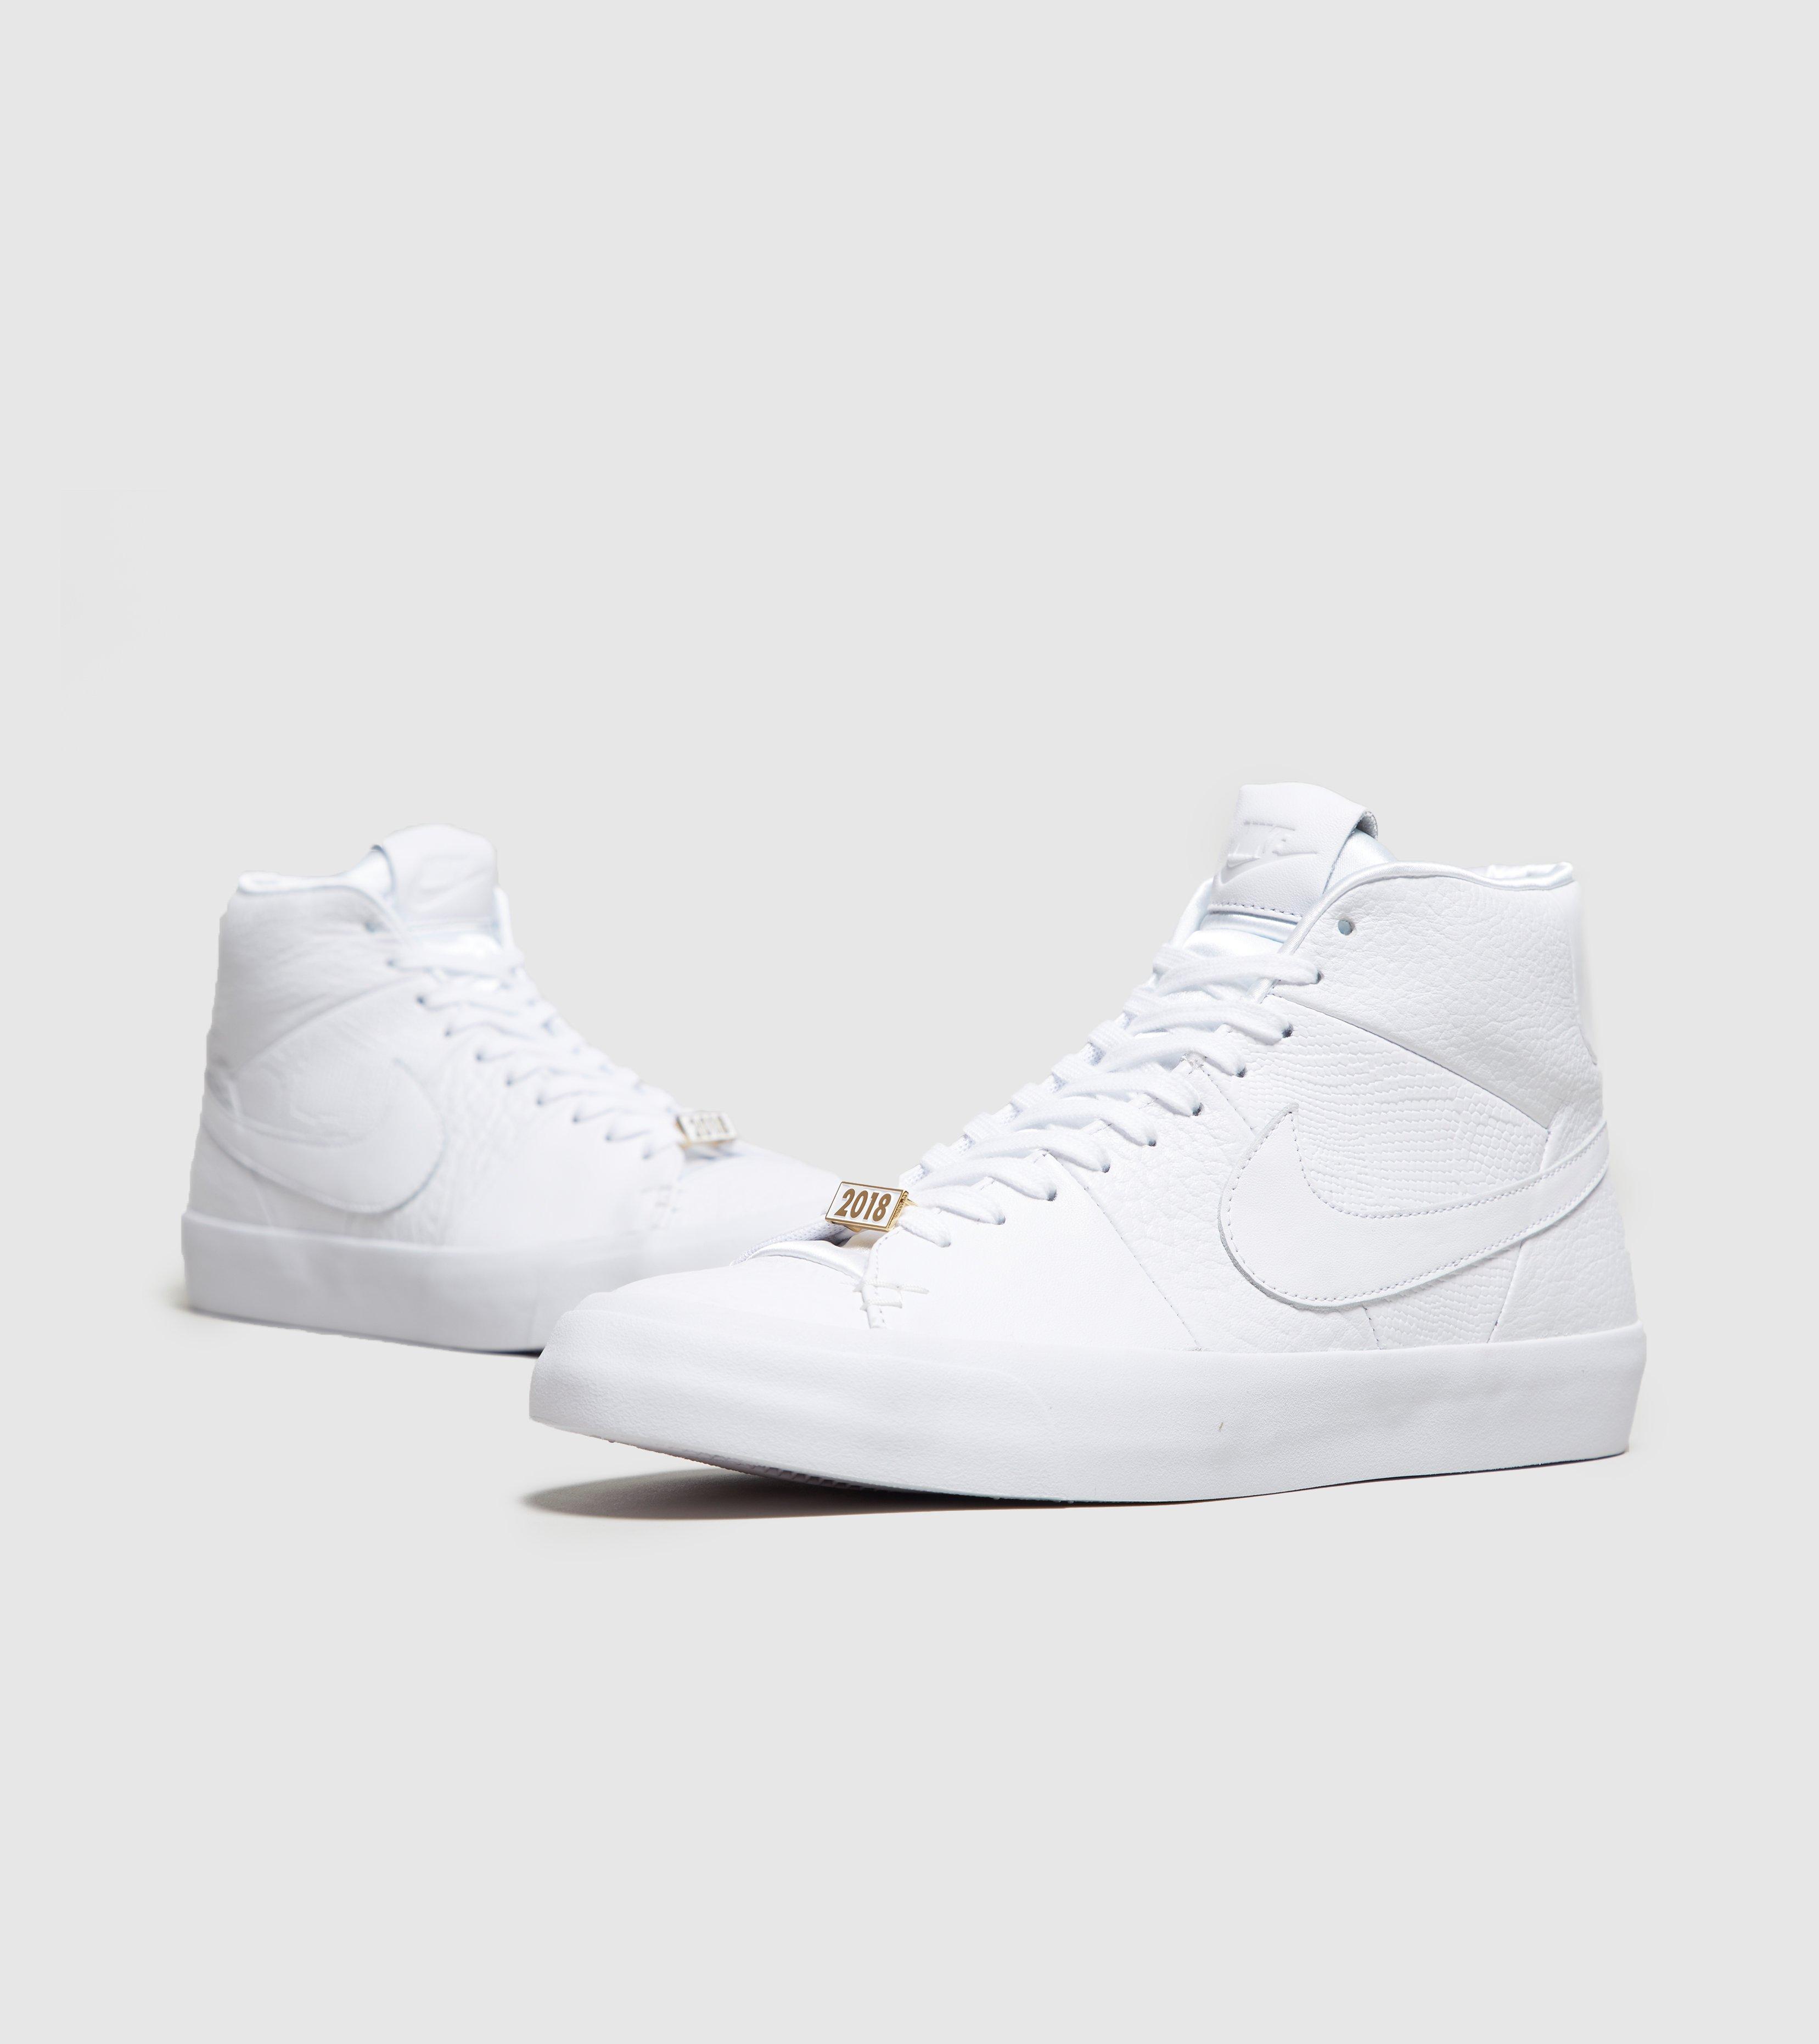 5a8f6b140 Shop Nike Nike Blazer City Ease Shoes Online on ZALORA Philippines;